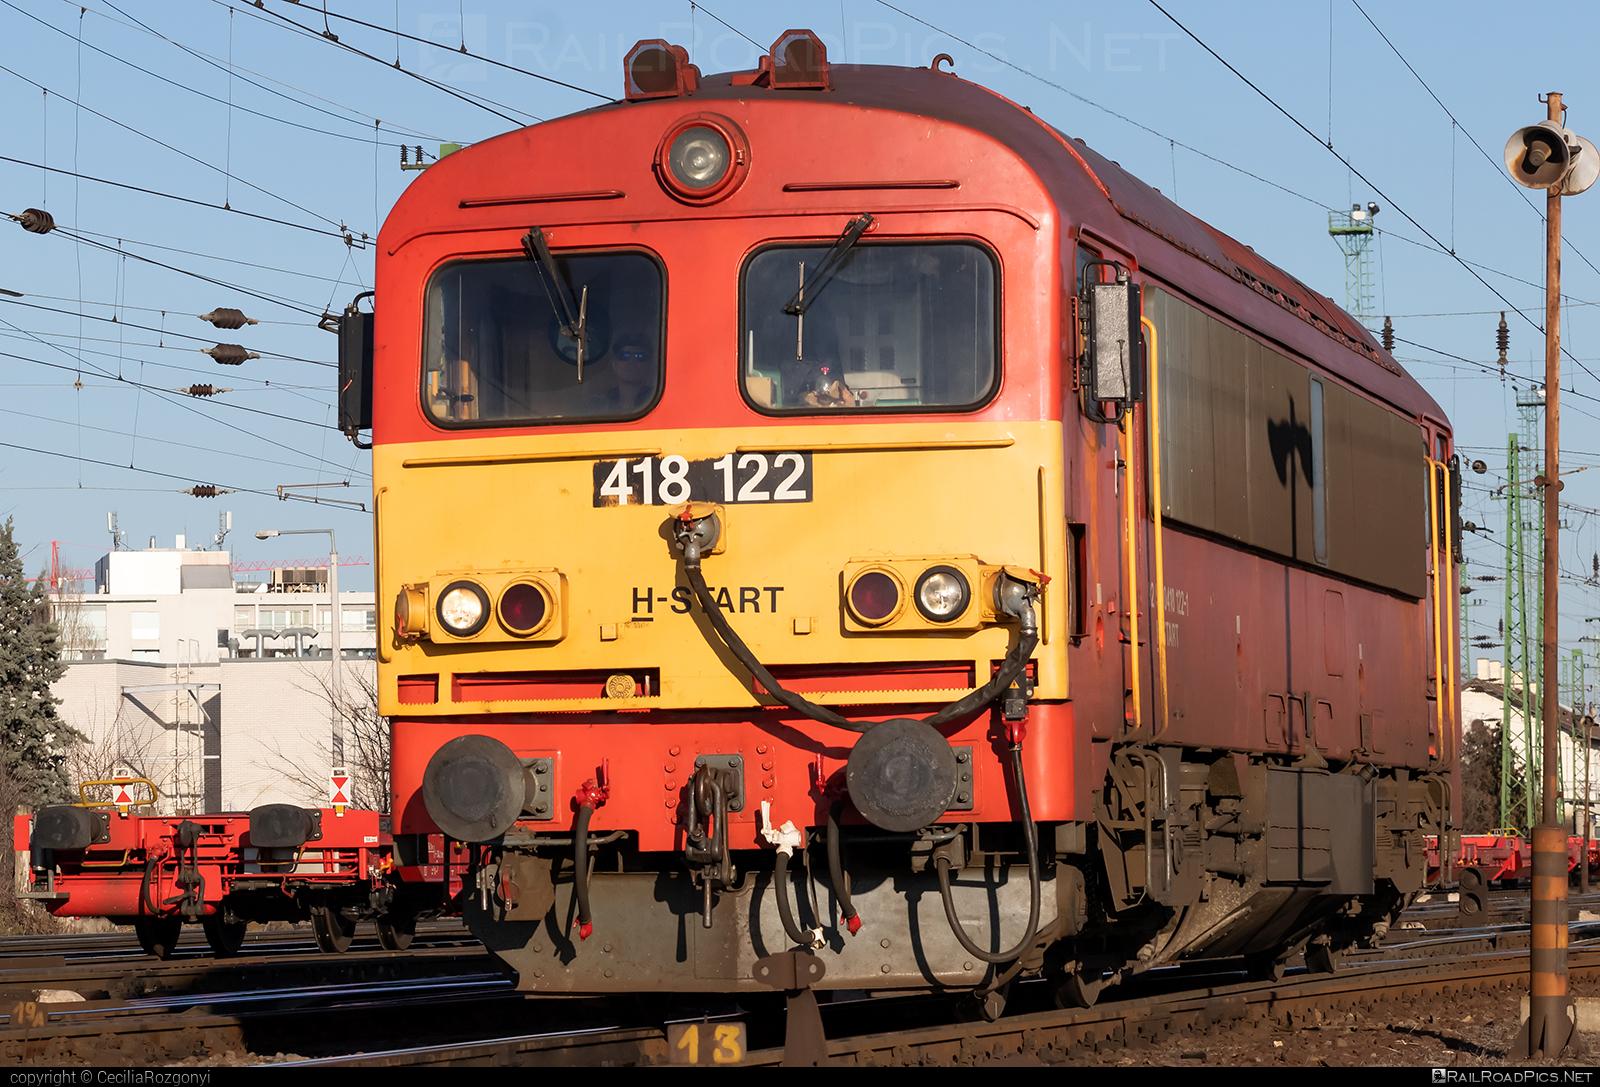 Ganz-MÁVAG DHM7-3 - 418 122 operated by MÁV-START ZRt. #dhm7 #dhm73 #ganzm41 #ganzmavag #ganzmavag418 #ganzmavagdhm7 #ganzmavagdhm73 #ganzmavagm41 #m41locomotive #mav #mavstart #mavstartzrt